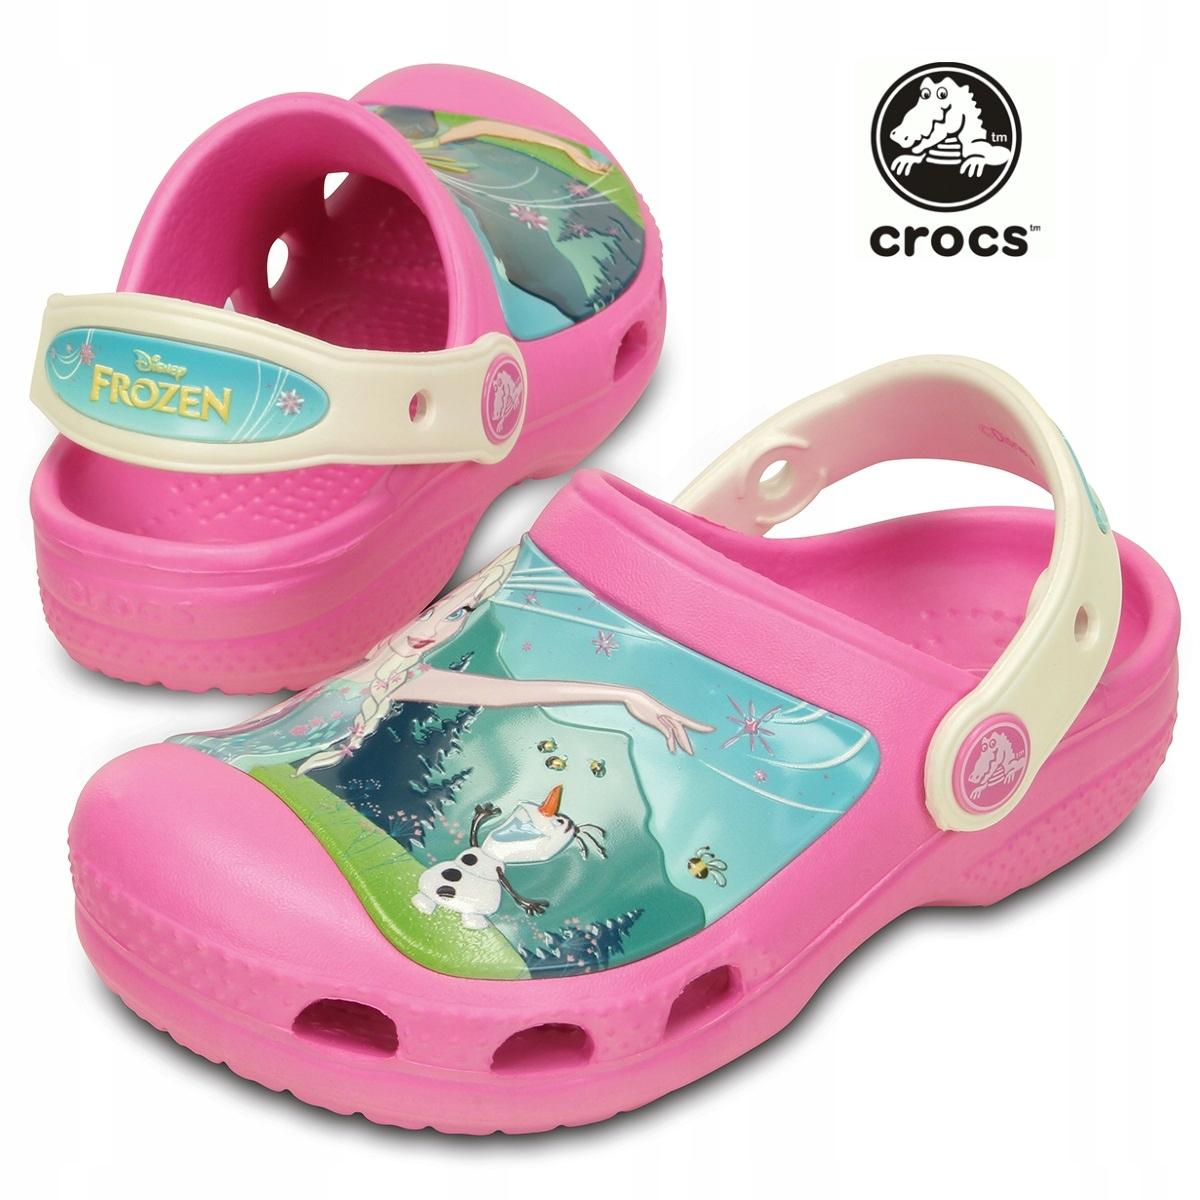 Crocs nowe Frozen roz. 34/35 J3 Elsa Anna